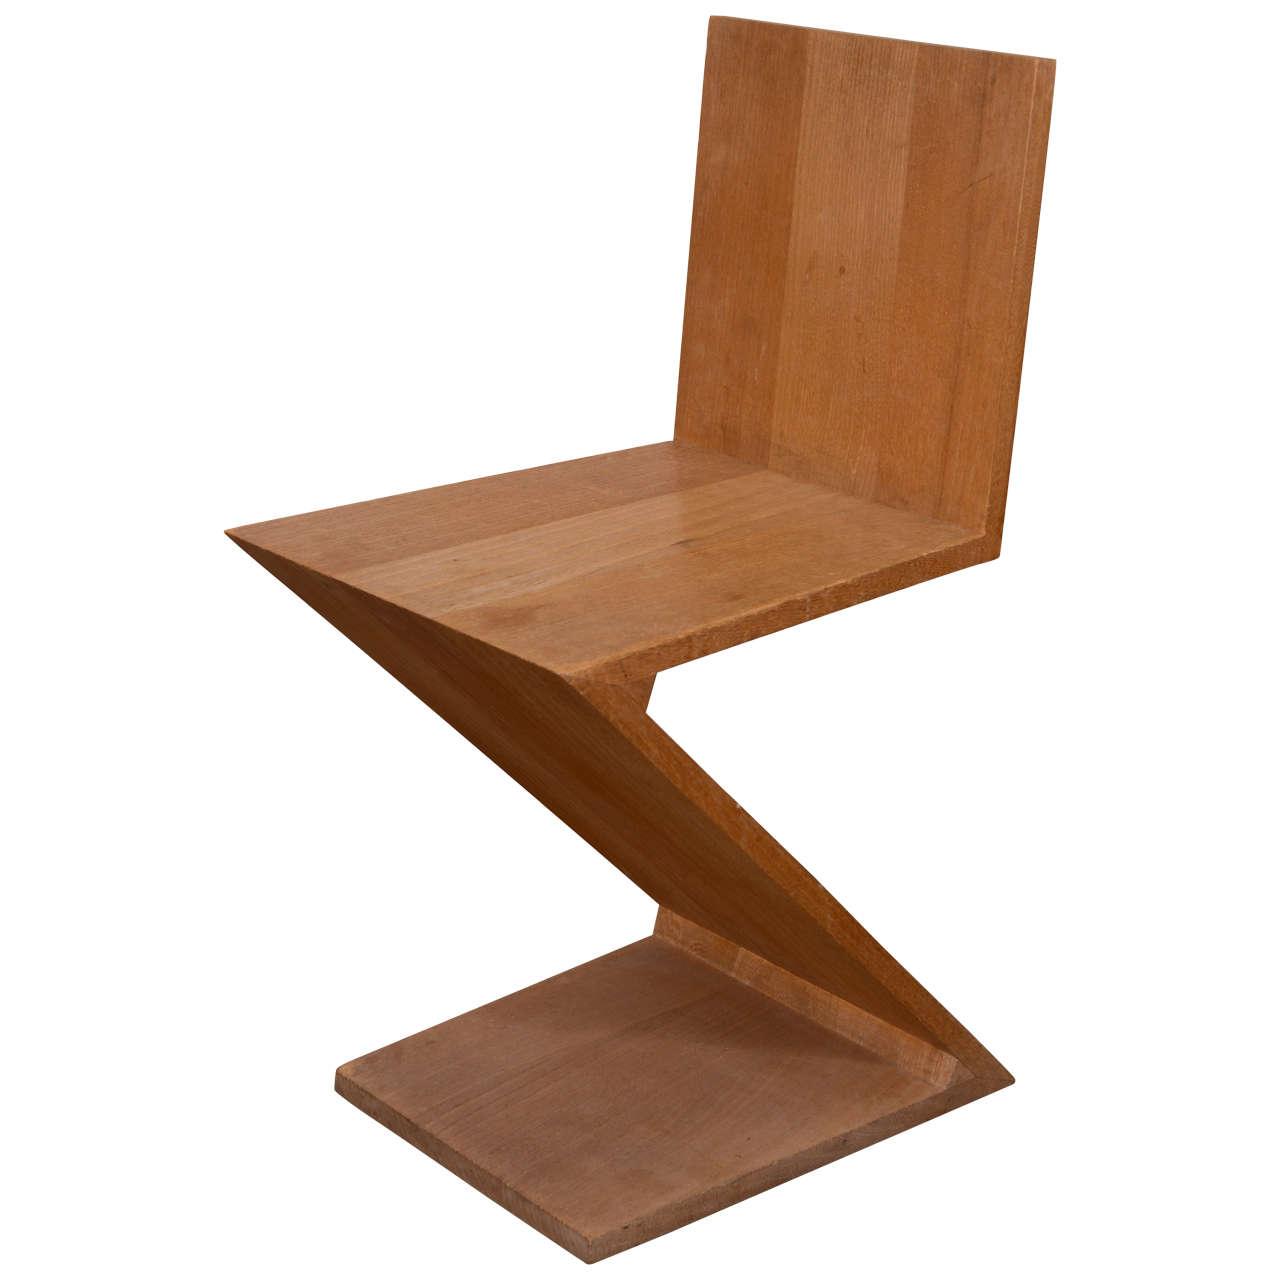 Gerrit rietveld zigzag chair design history 2009 chairs for Design stuhl zig zag